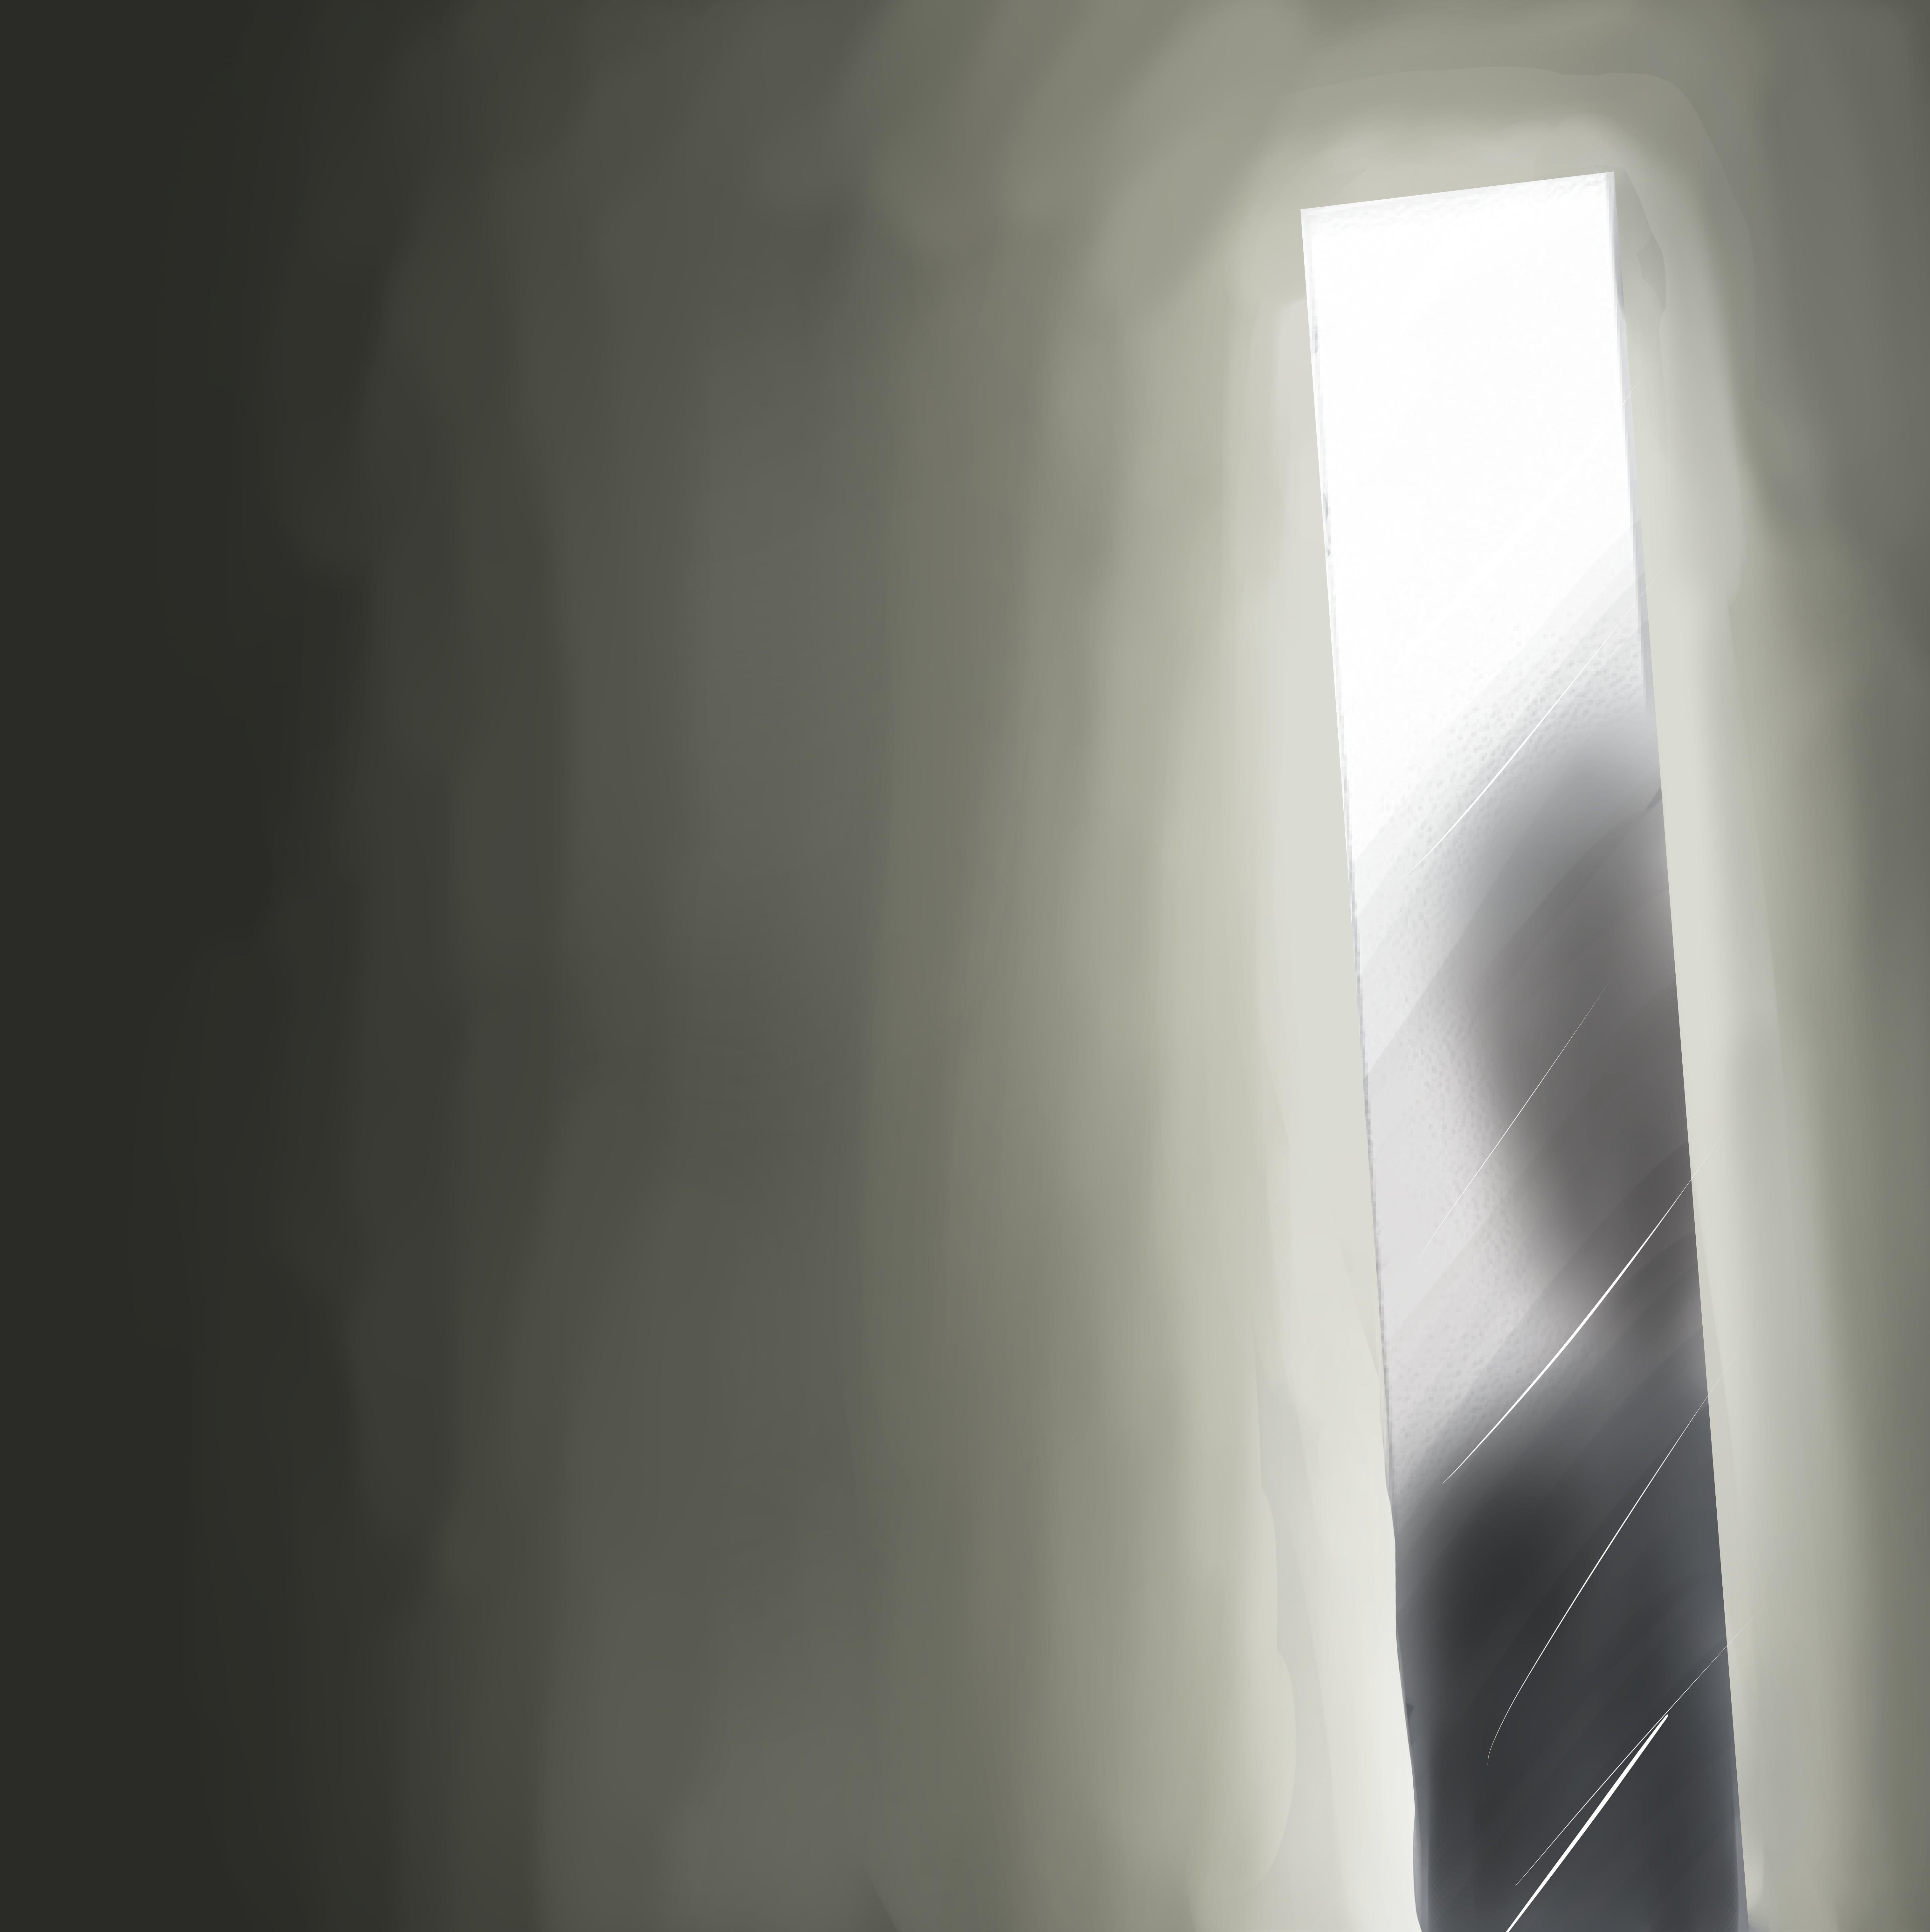 Illustration by Michi Sora